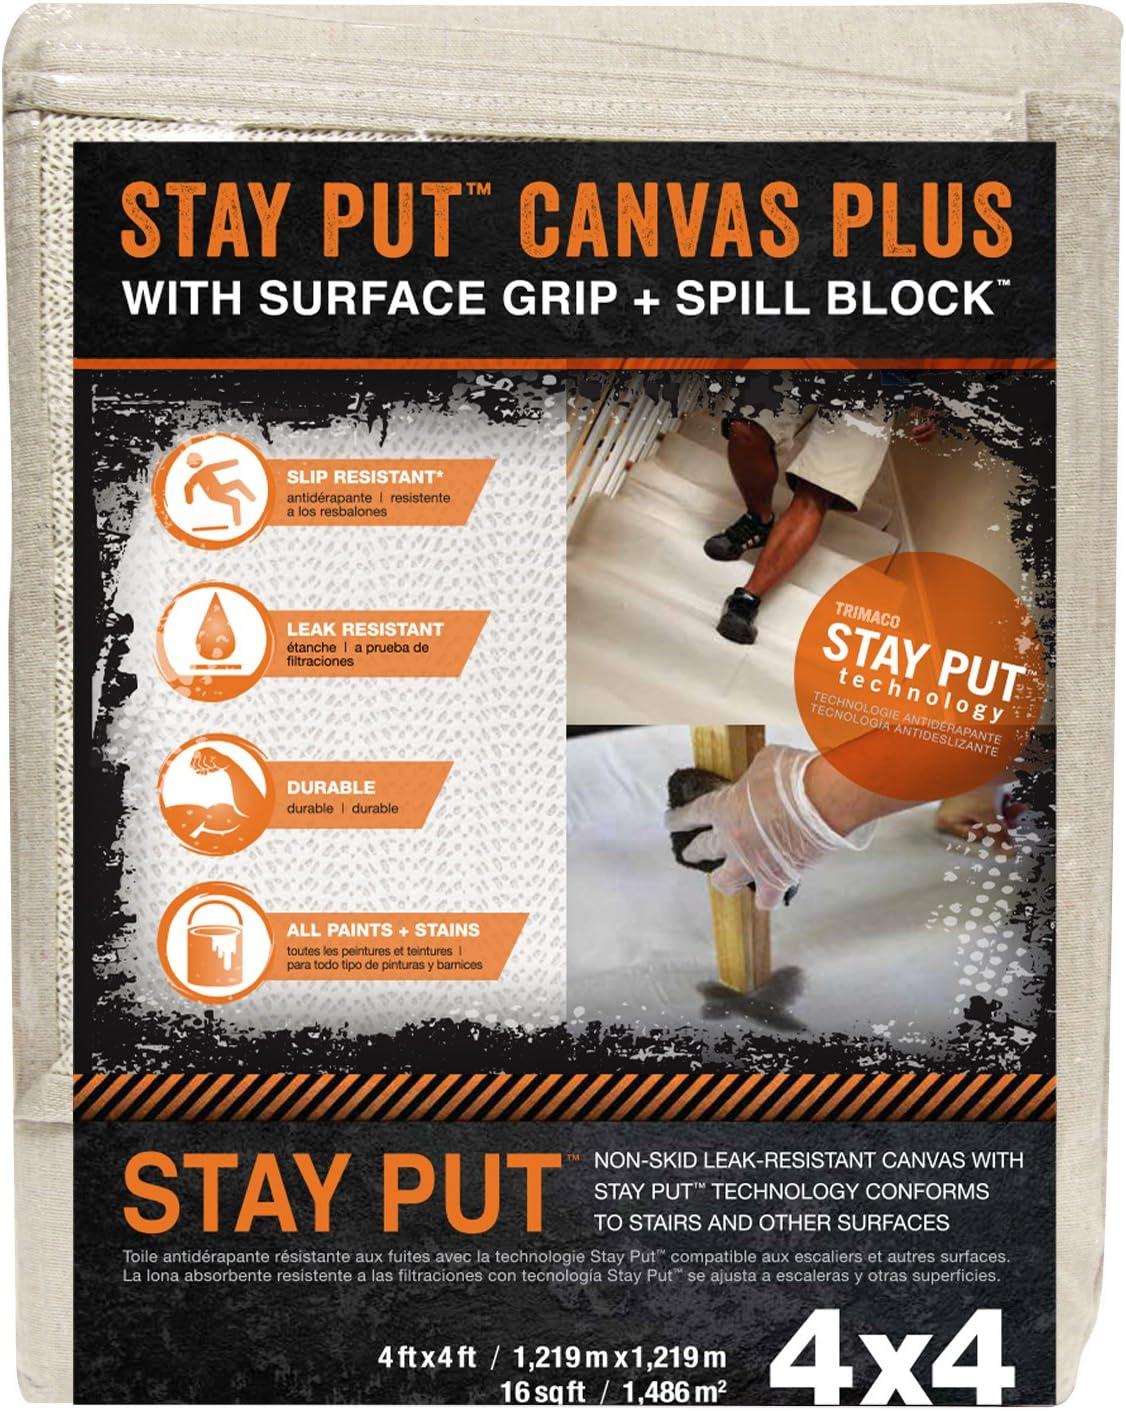 Trimaco 04324 Slip Resistant Dropcloth Stay Put Canvas Plus Drop Cloth, x 4-feet, Tan - -